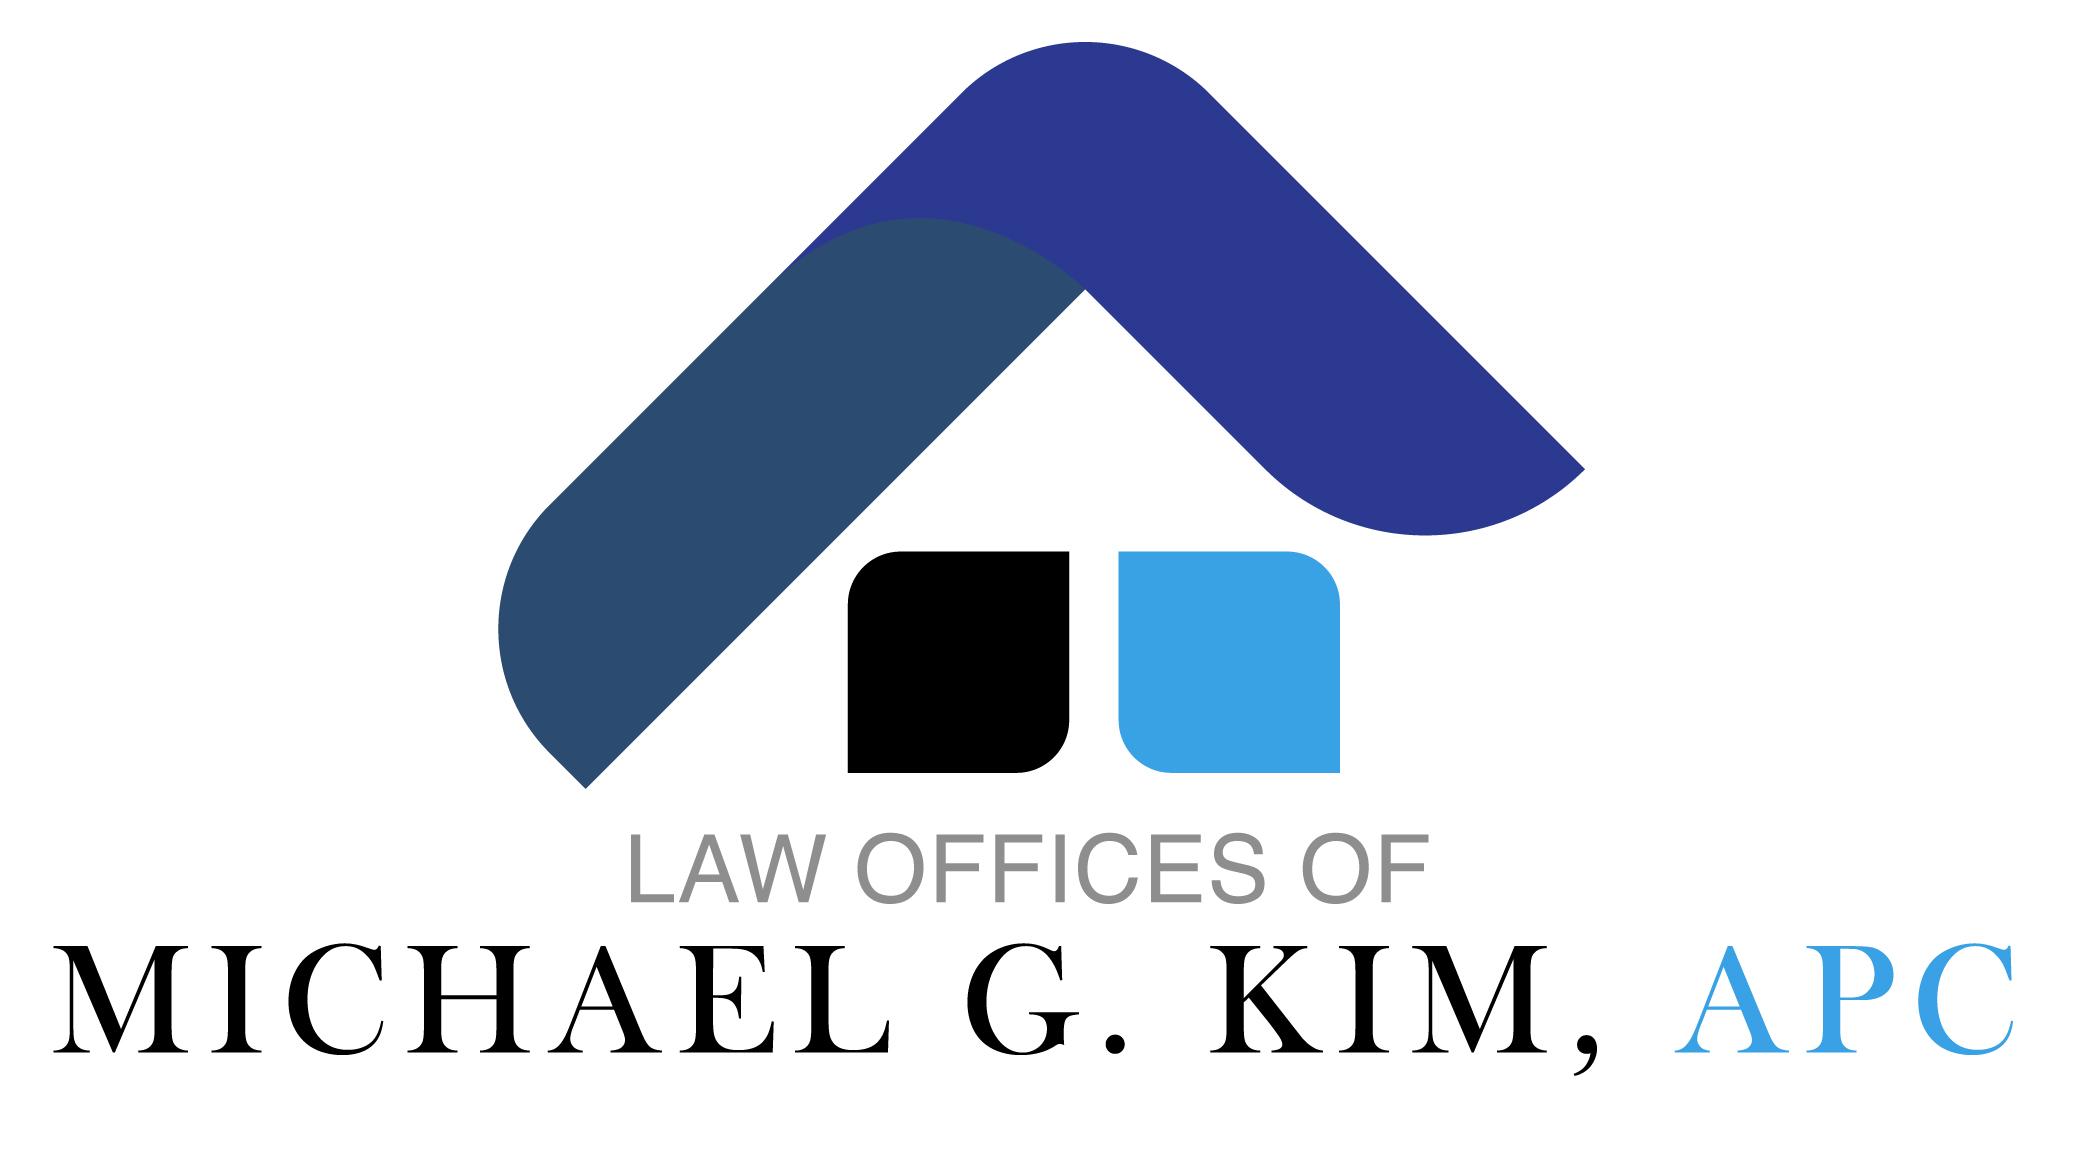 Mike Kim Law